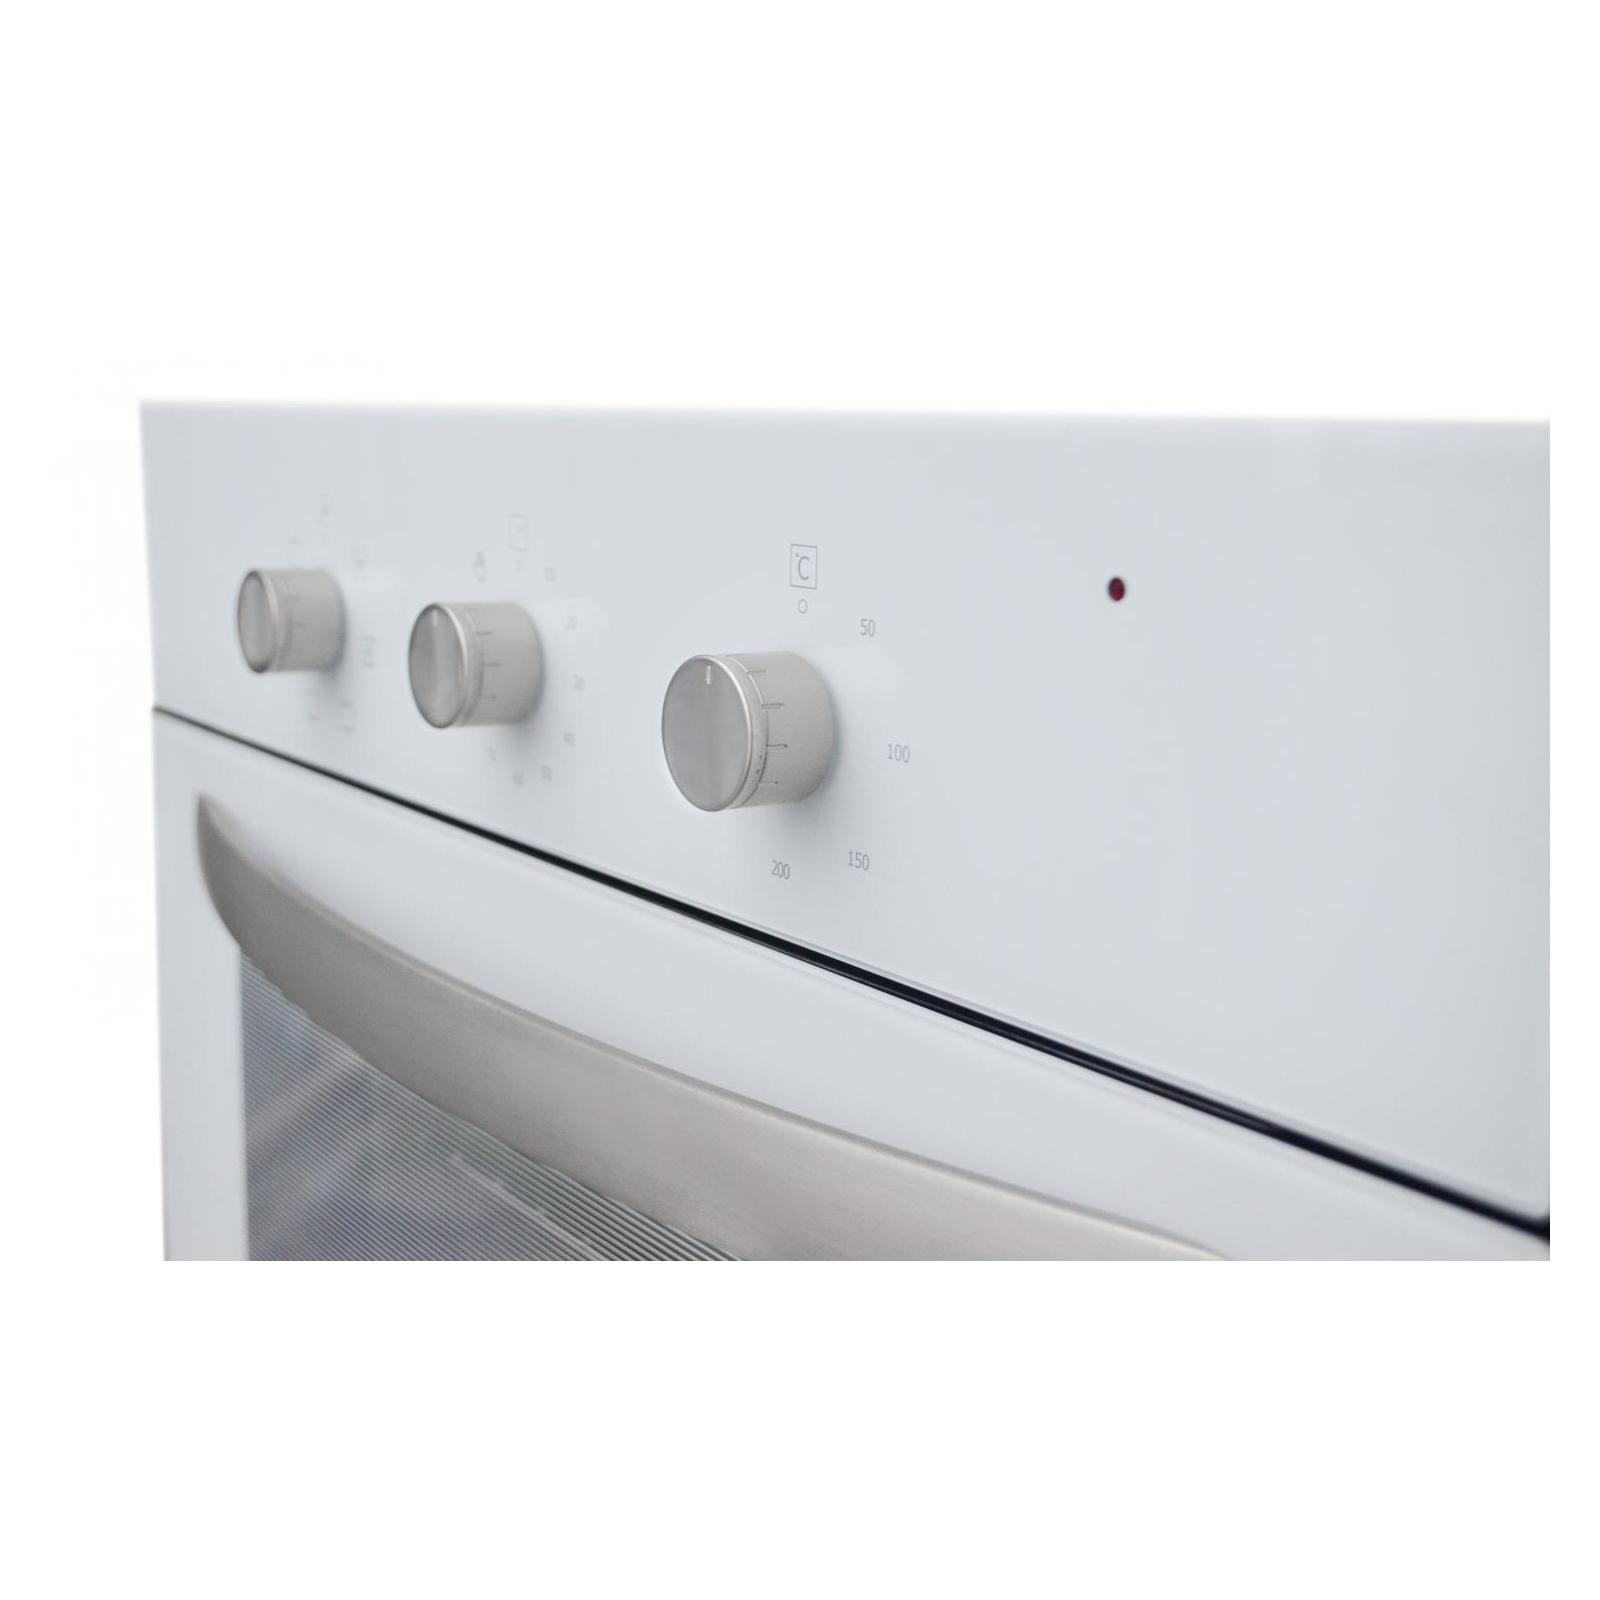 Духовой шкаф Borgio OFA 100.00 (White Glass) изображение 3